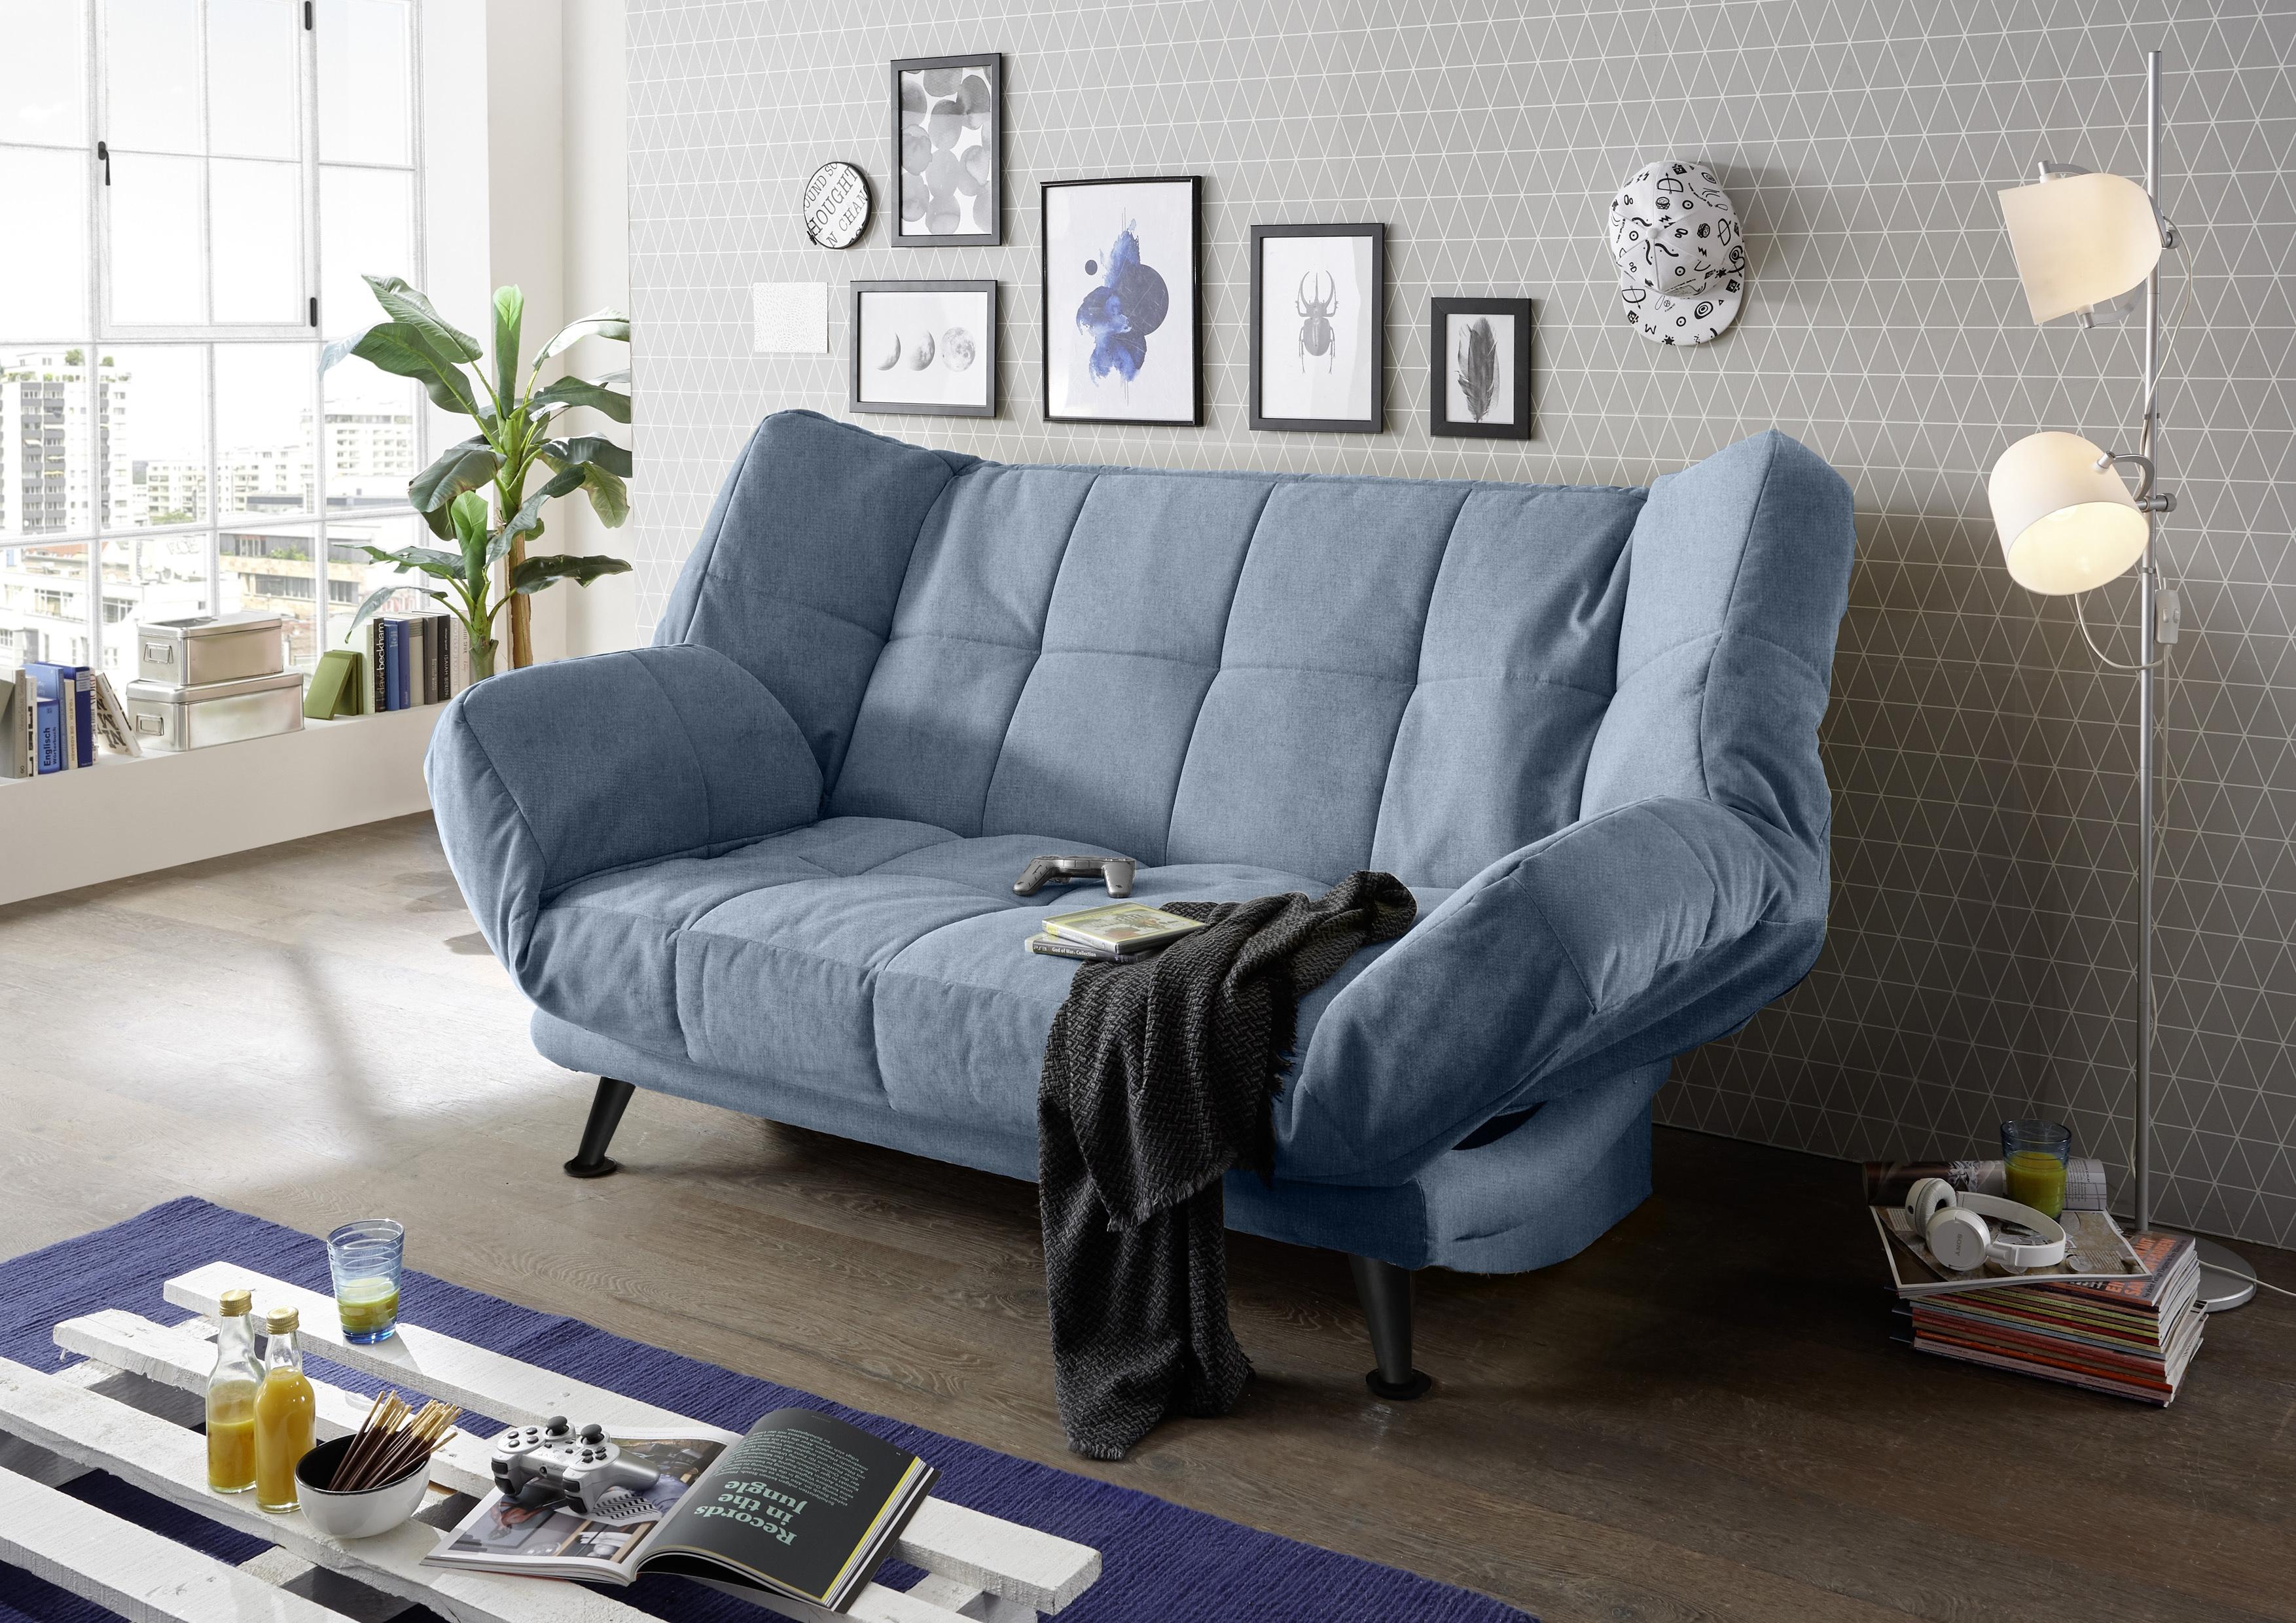 Canapea extensibila cu lada de depozitare, tapitata cu stofa, 3 locuri Ikaris 2 Albastru, l208xA98xH102 cm somproduct.ro